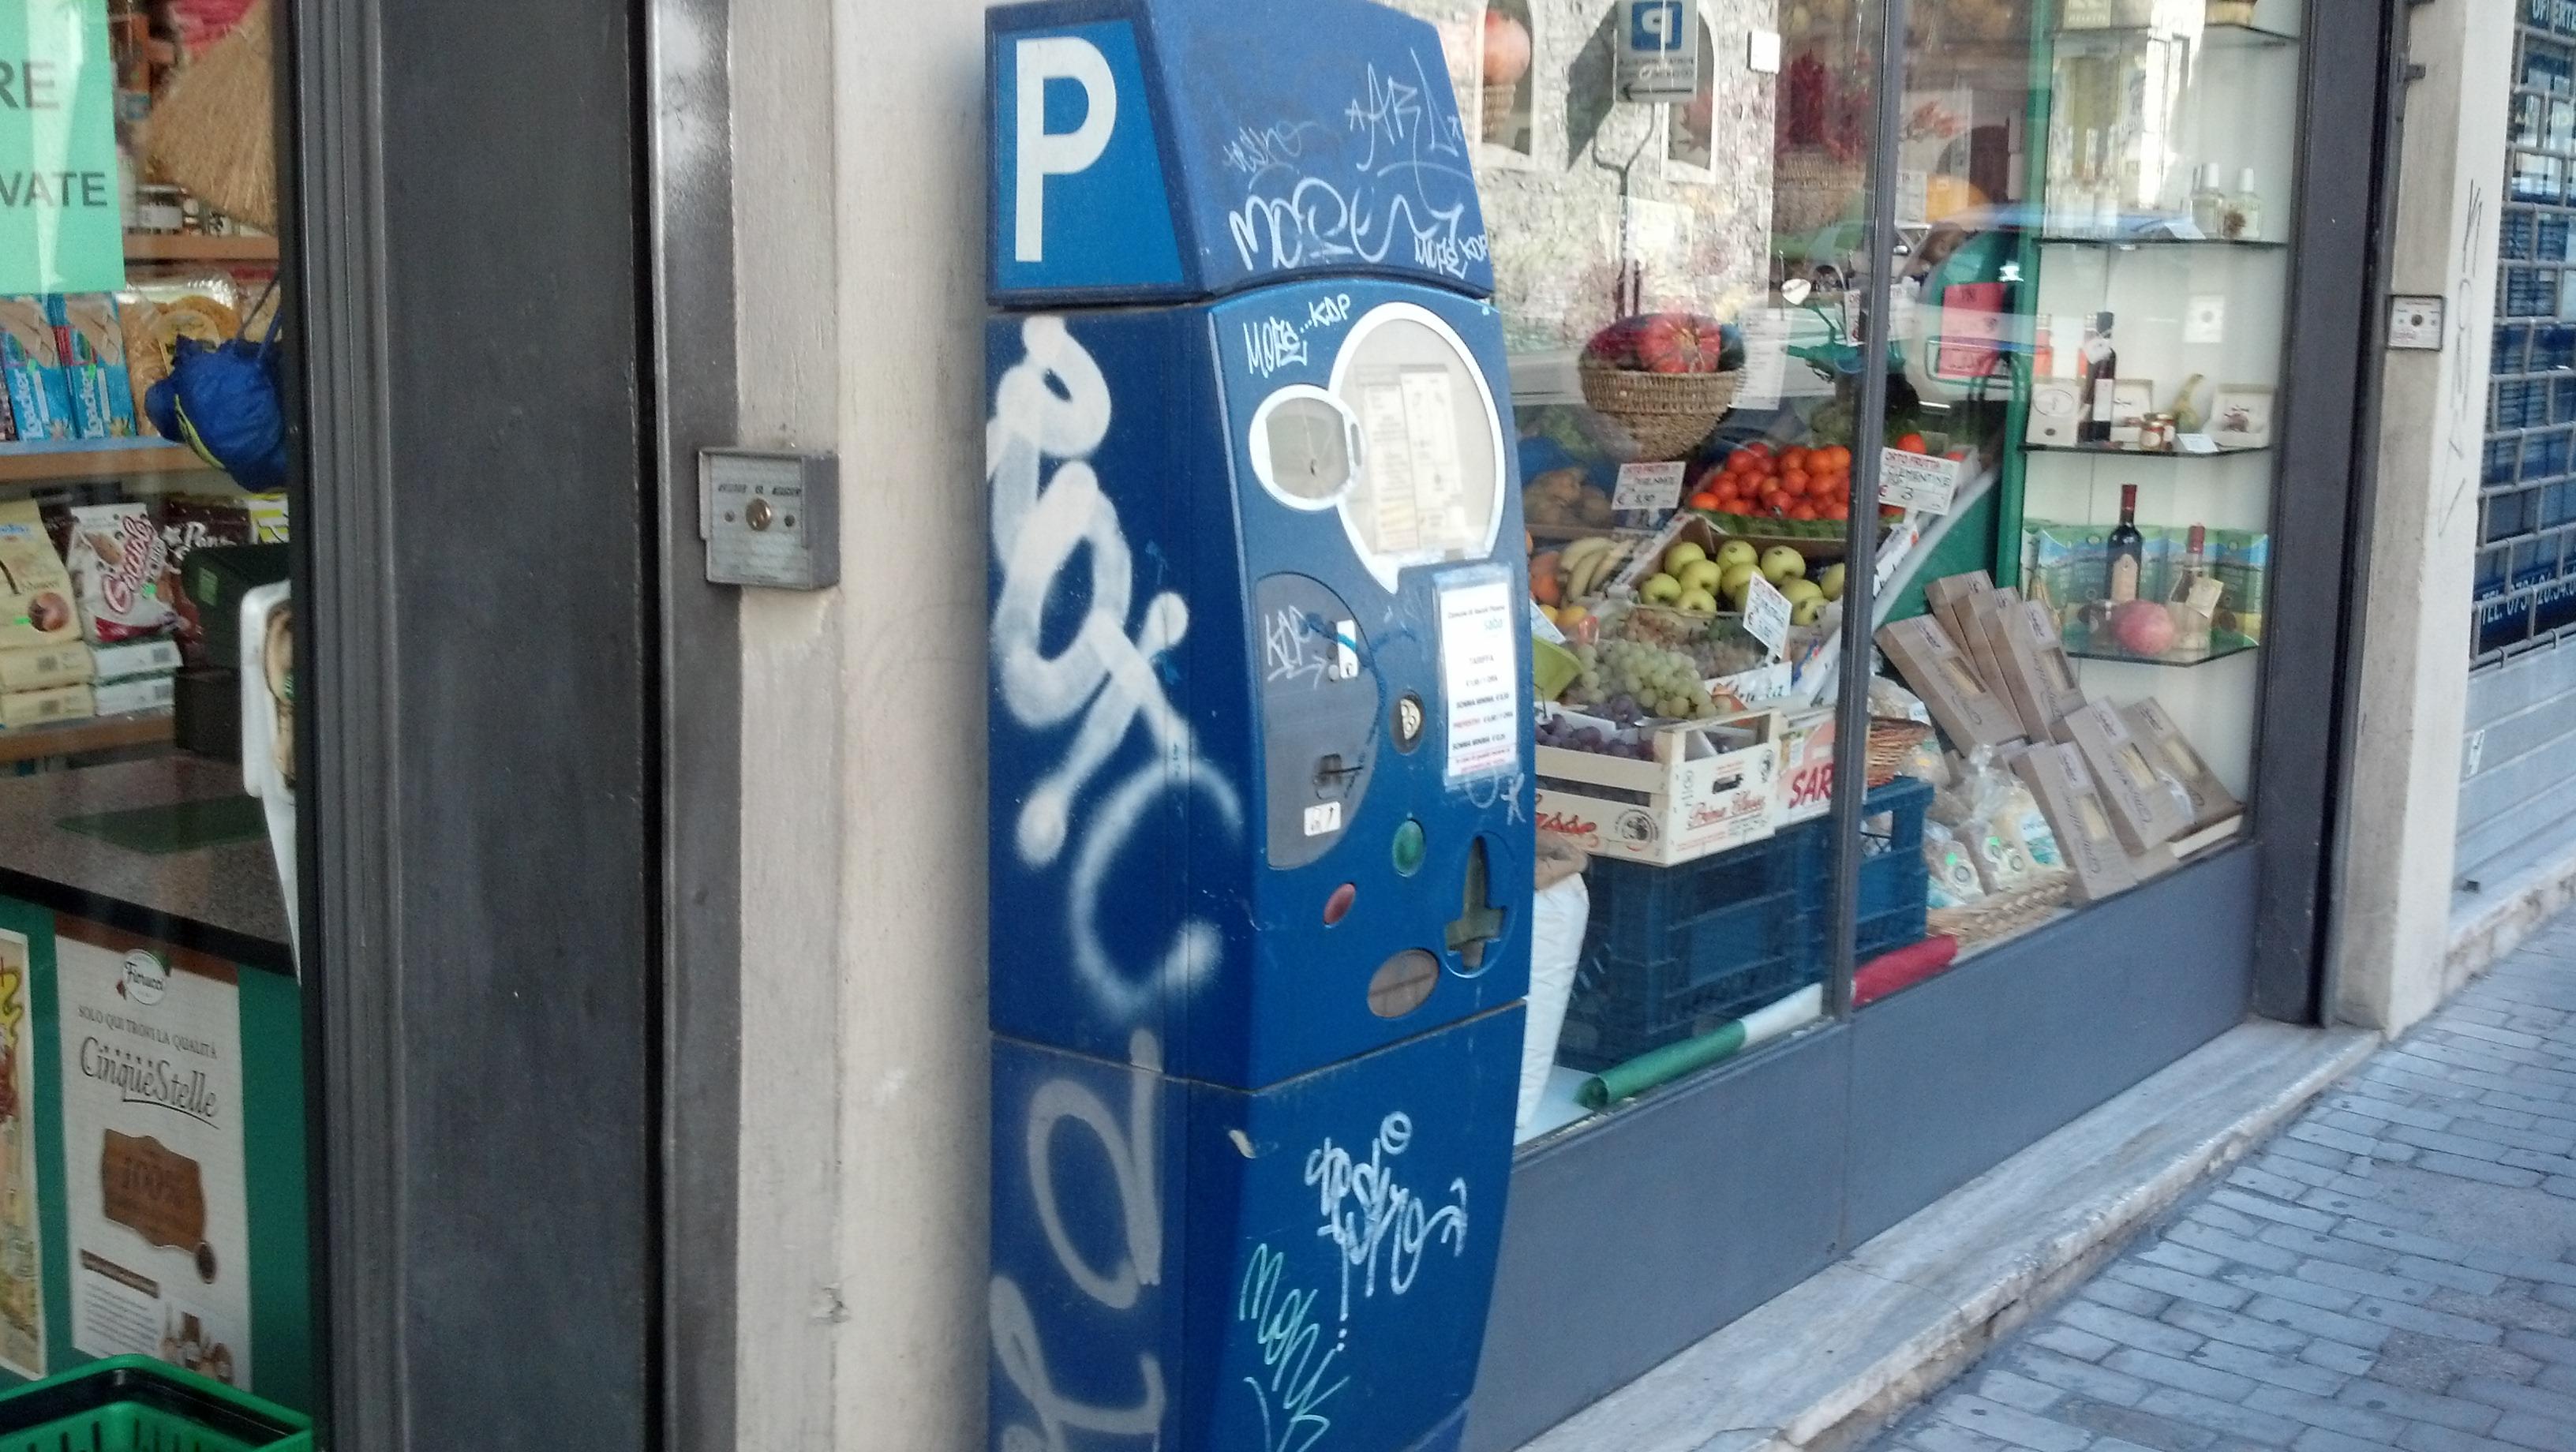 Graffiti ad Ascoli, ottobre 2012 17